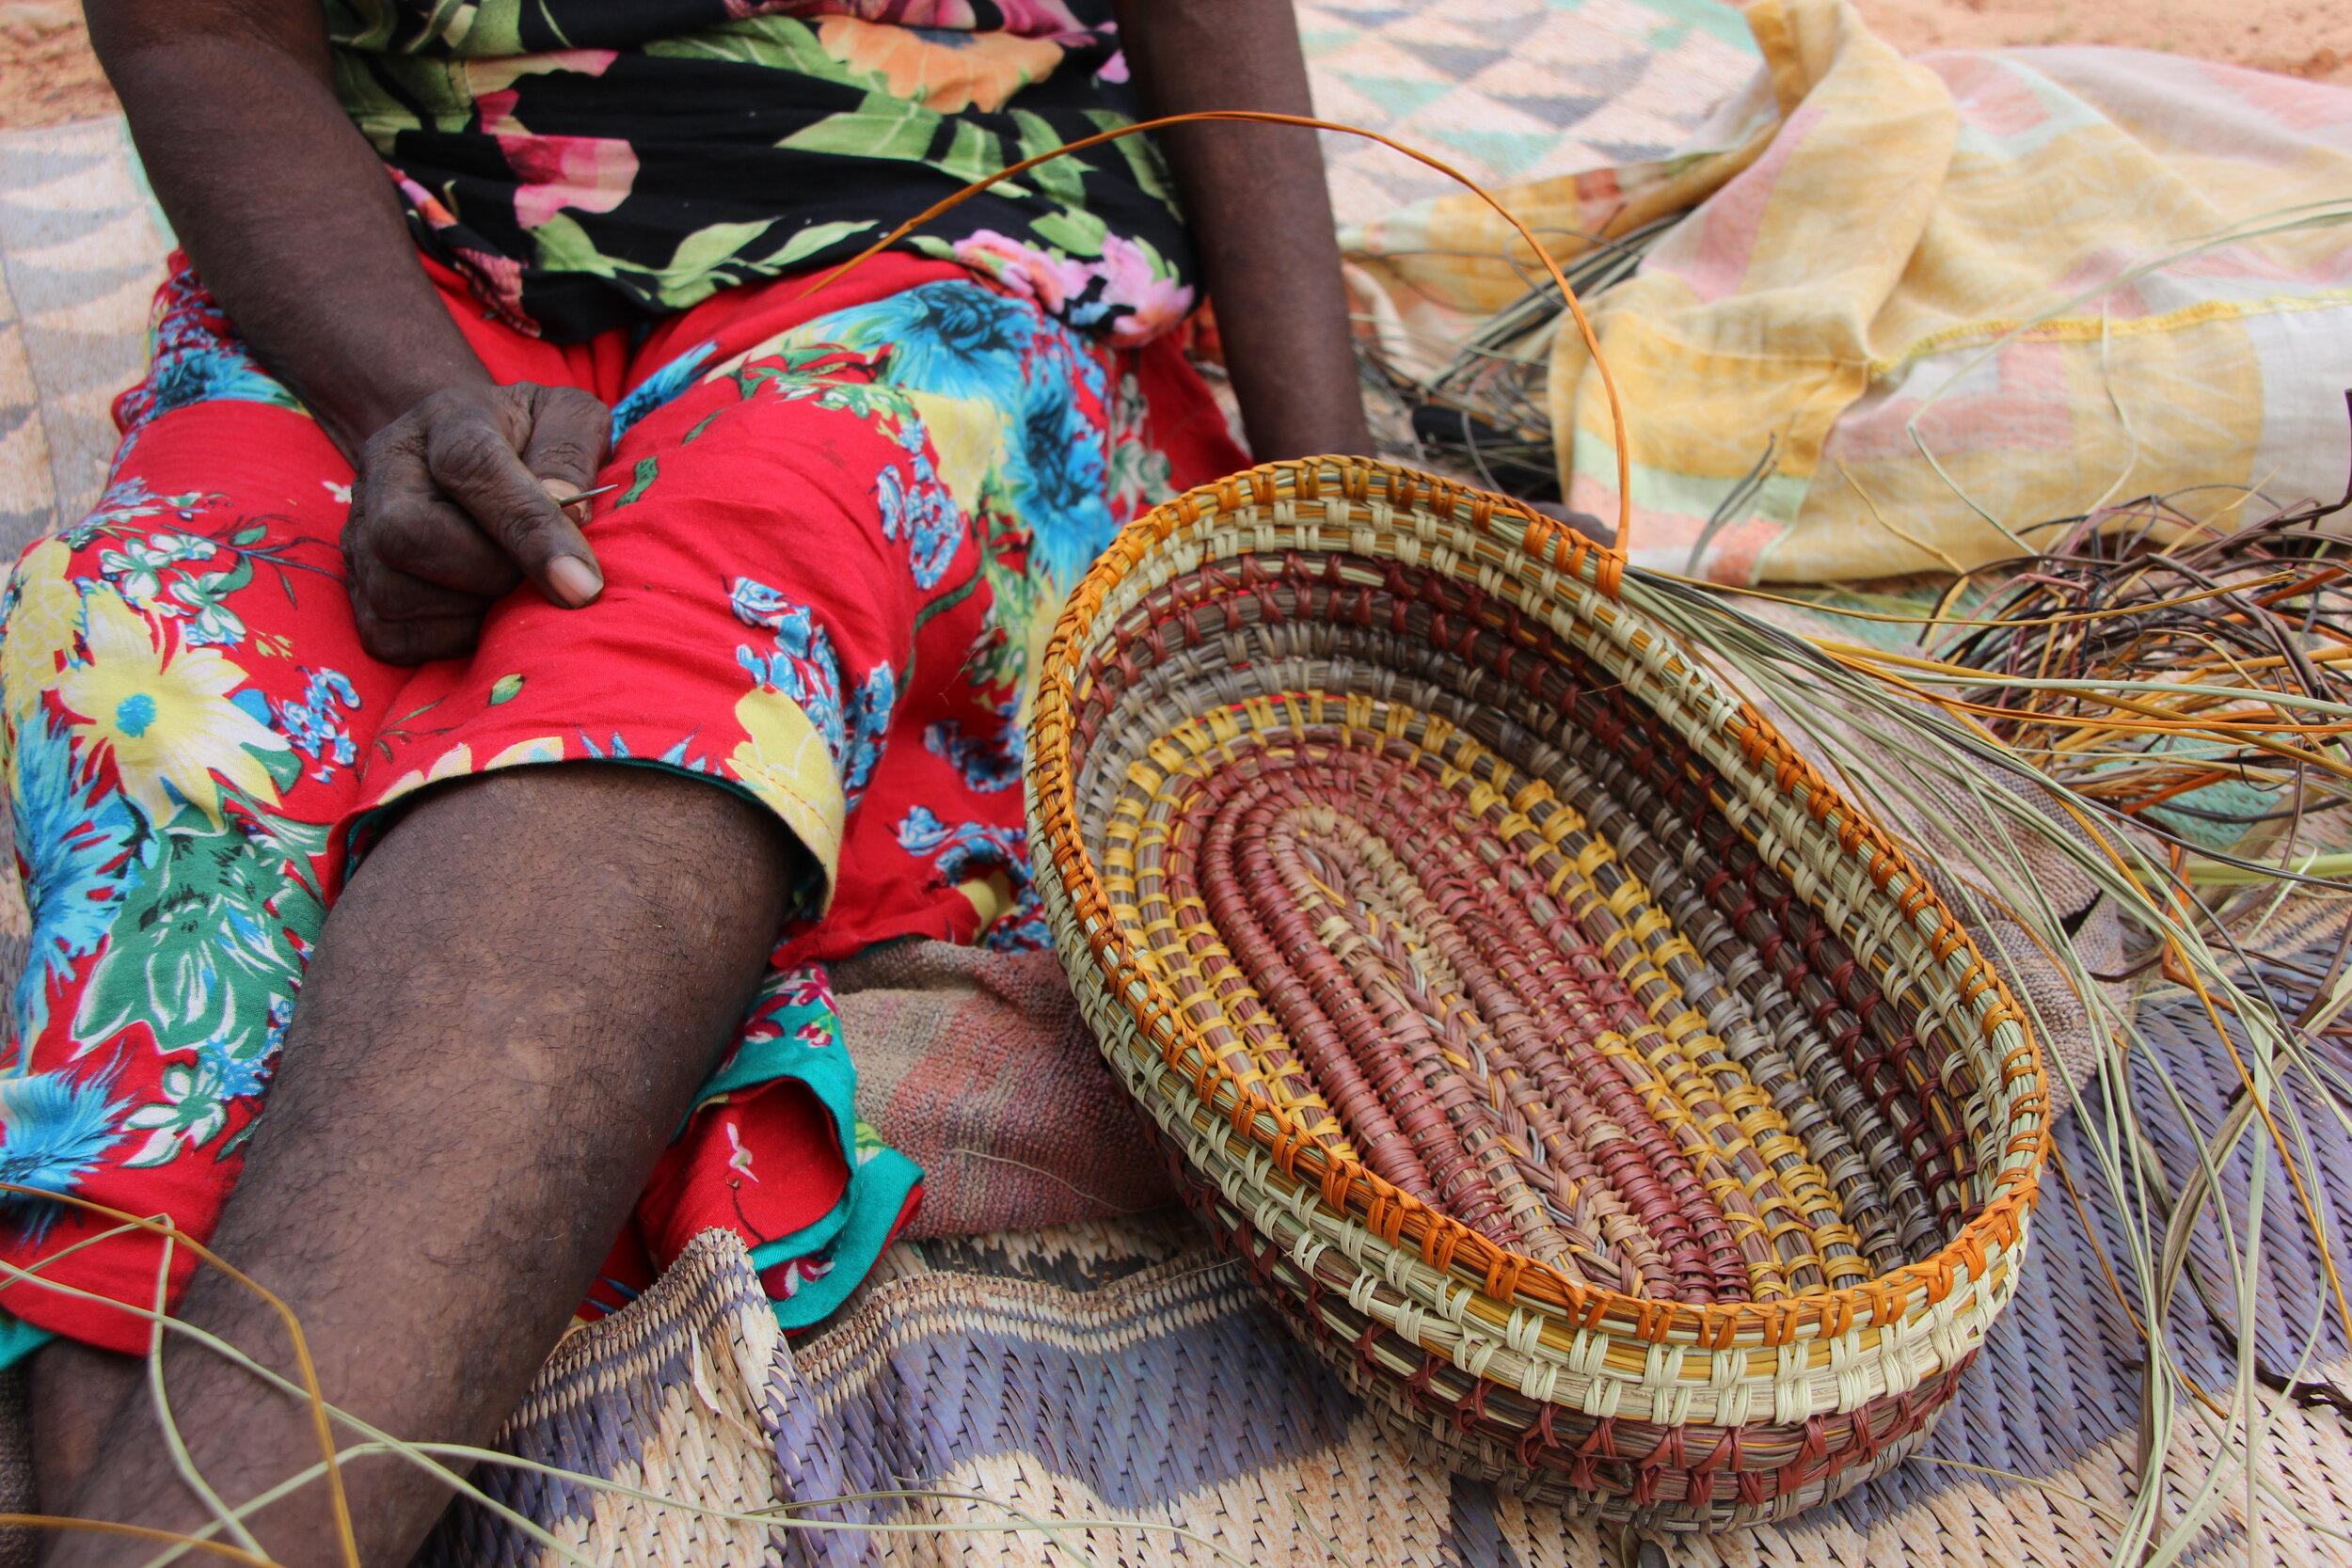 Weaving pandanus in New Sub, Maningrida. Image by Ingrid Johanson.